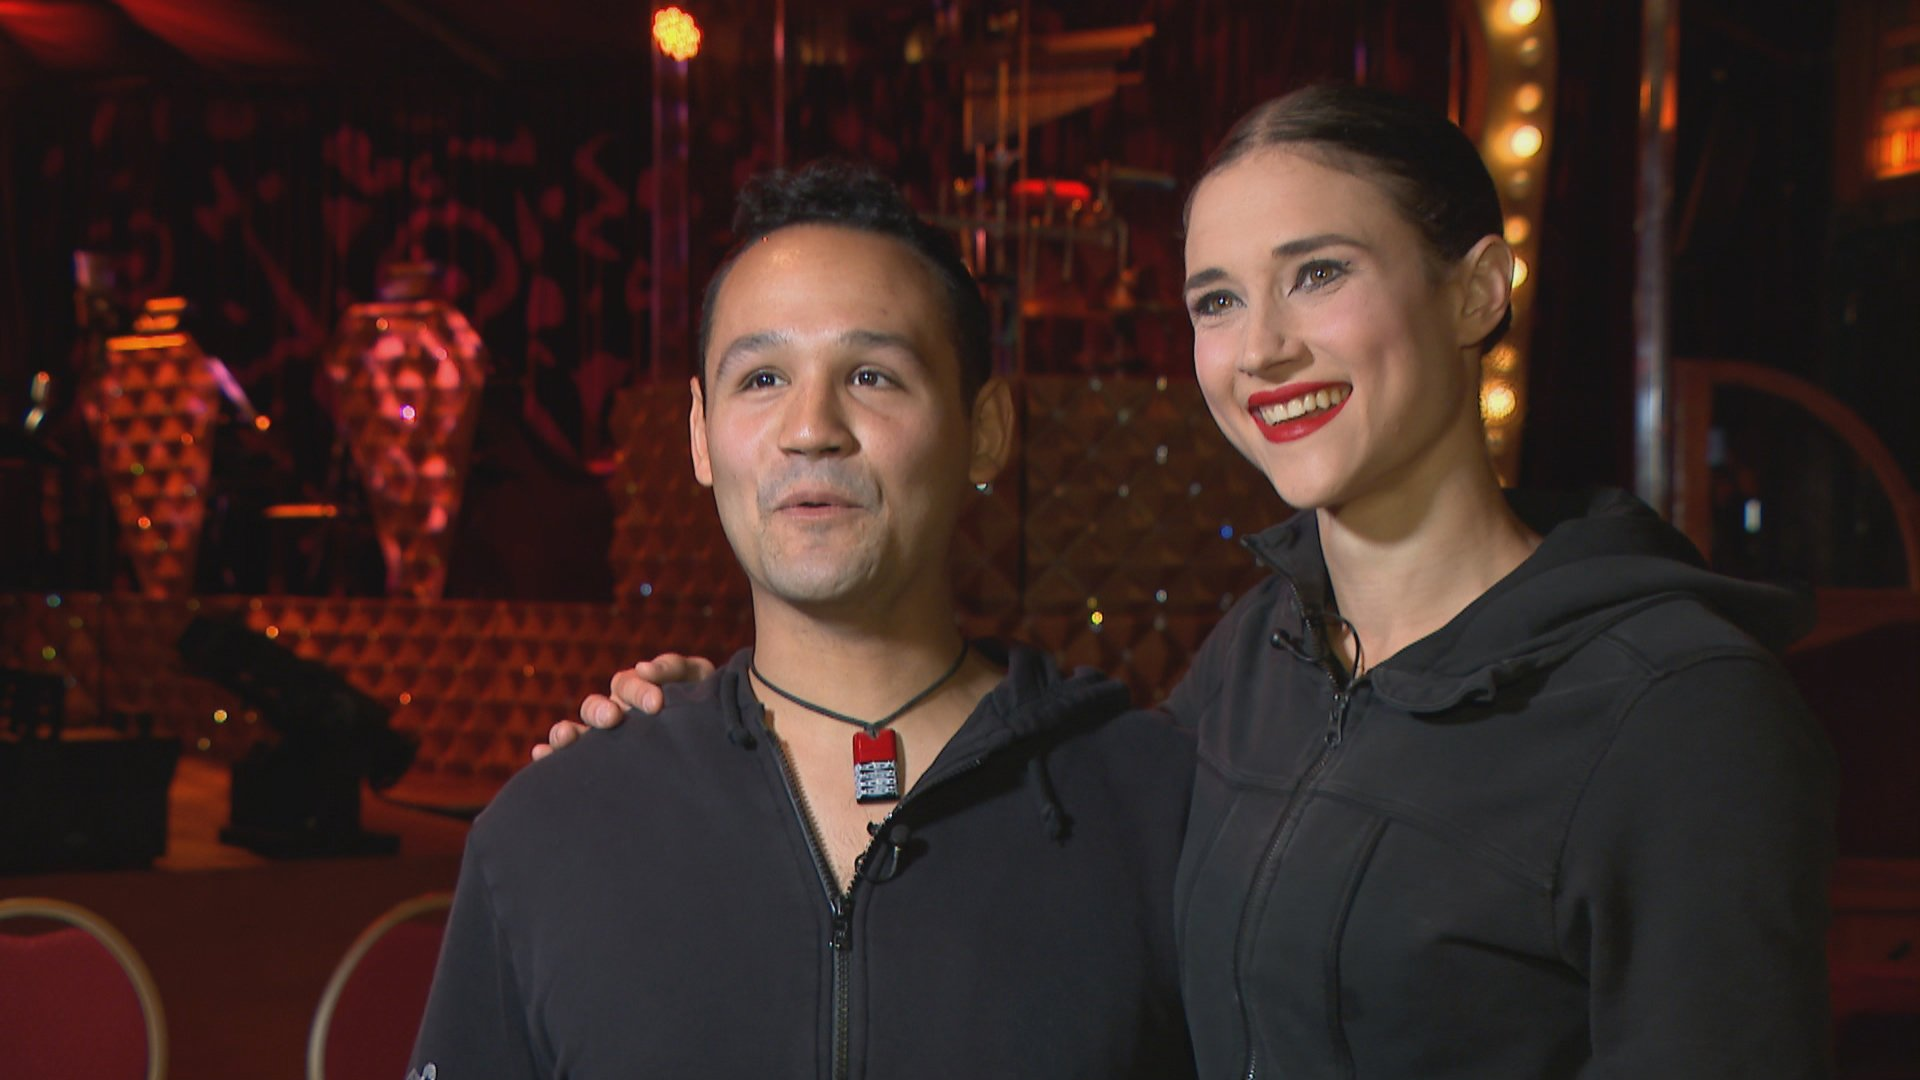 Teatro ZinZanni Brings Vegas-Style Vaudeville Show to Chicago Loop